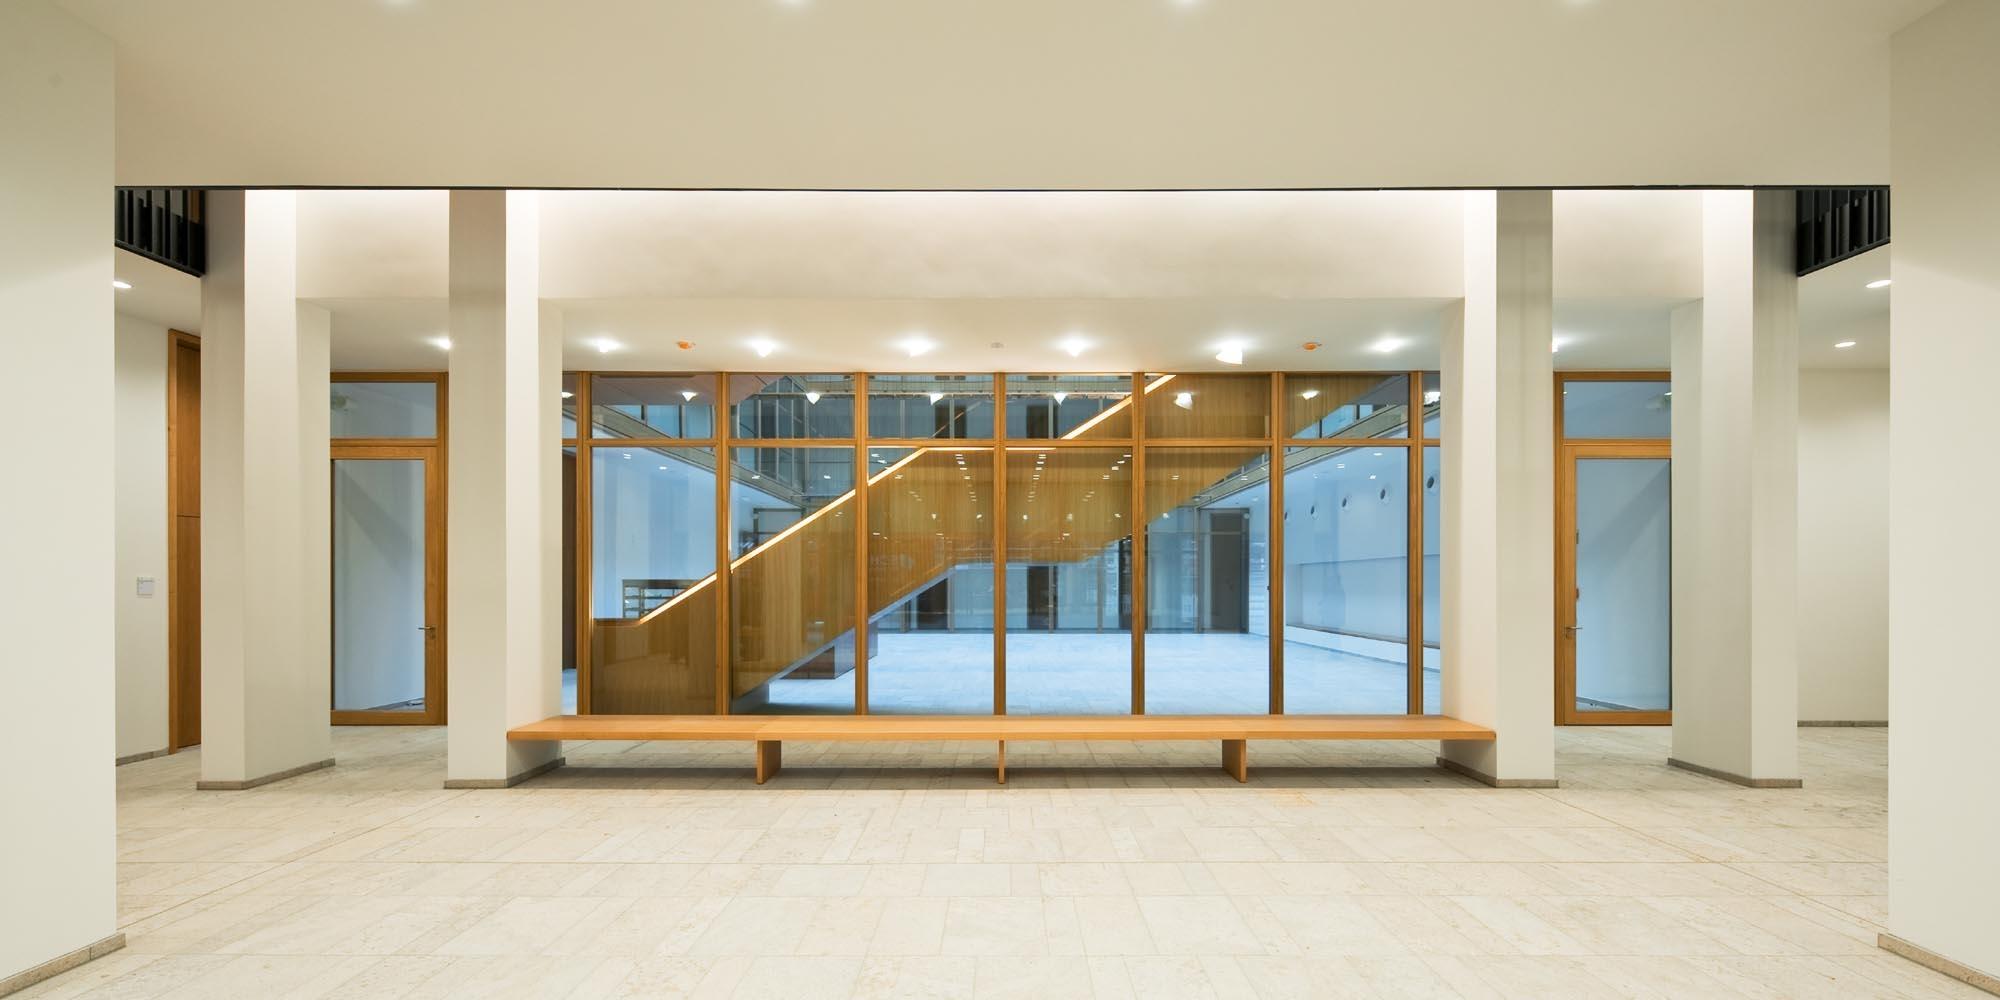 Justizzentrum - Foyer